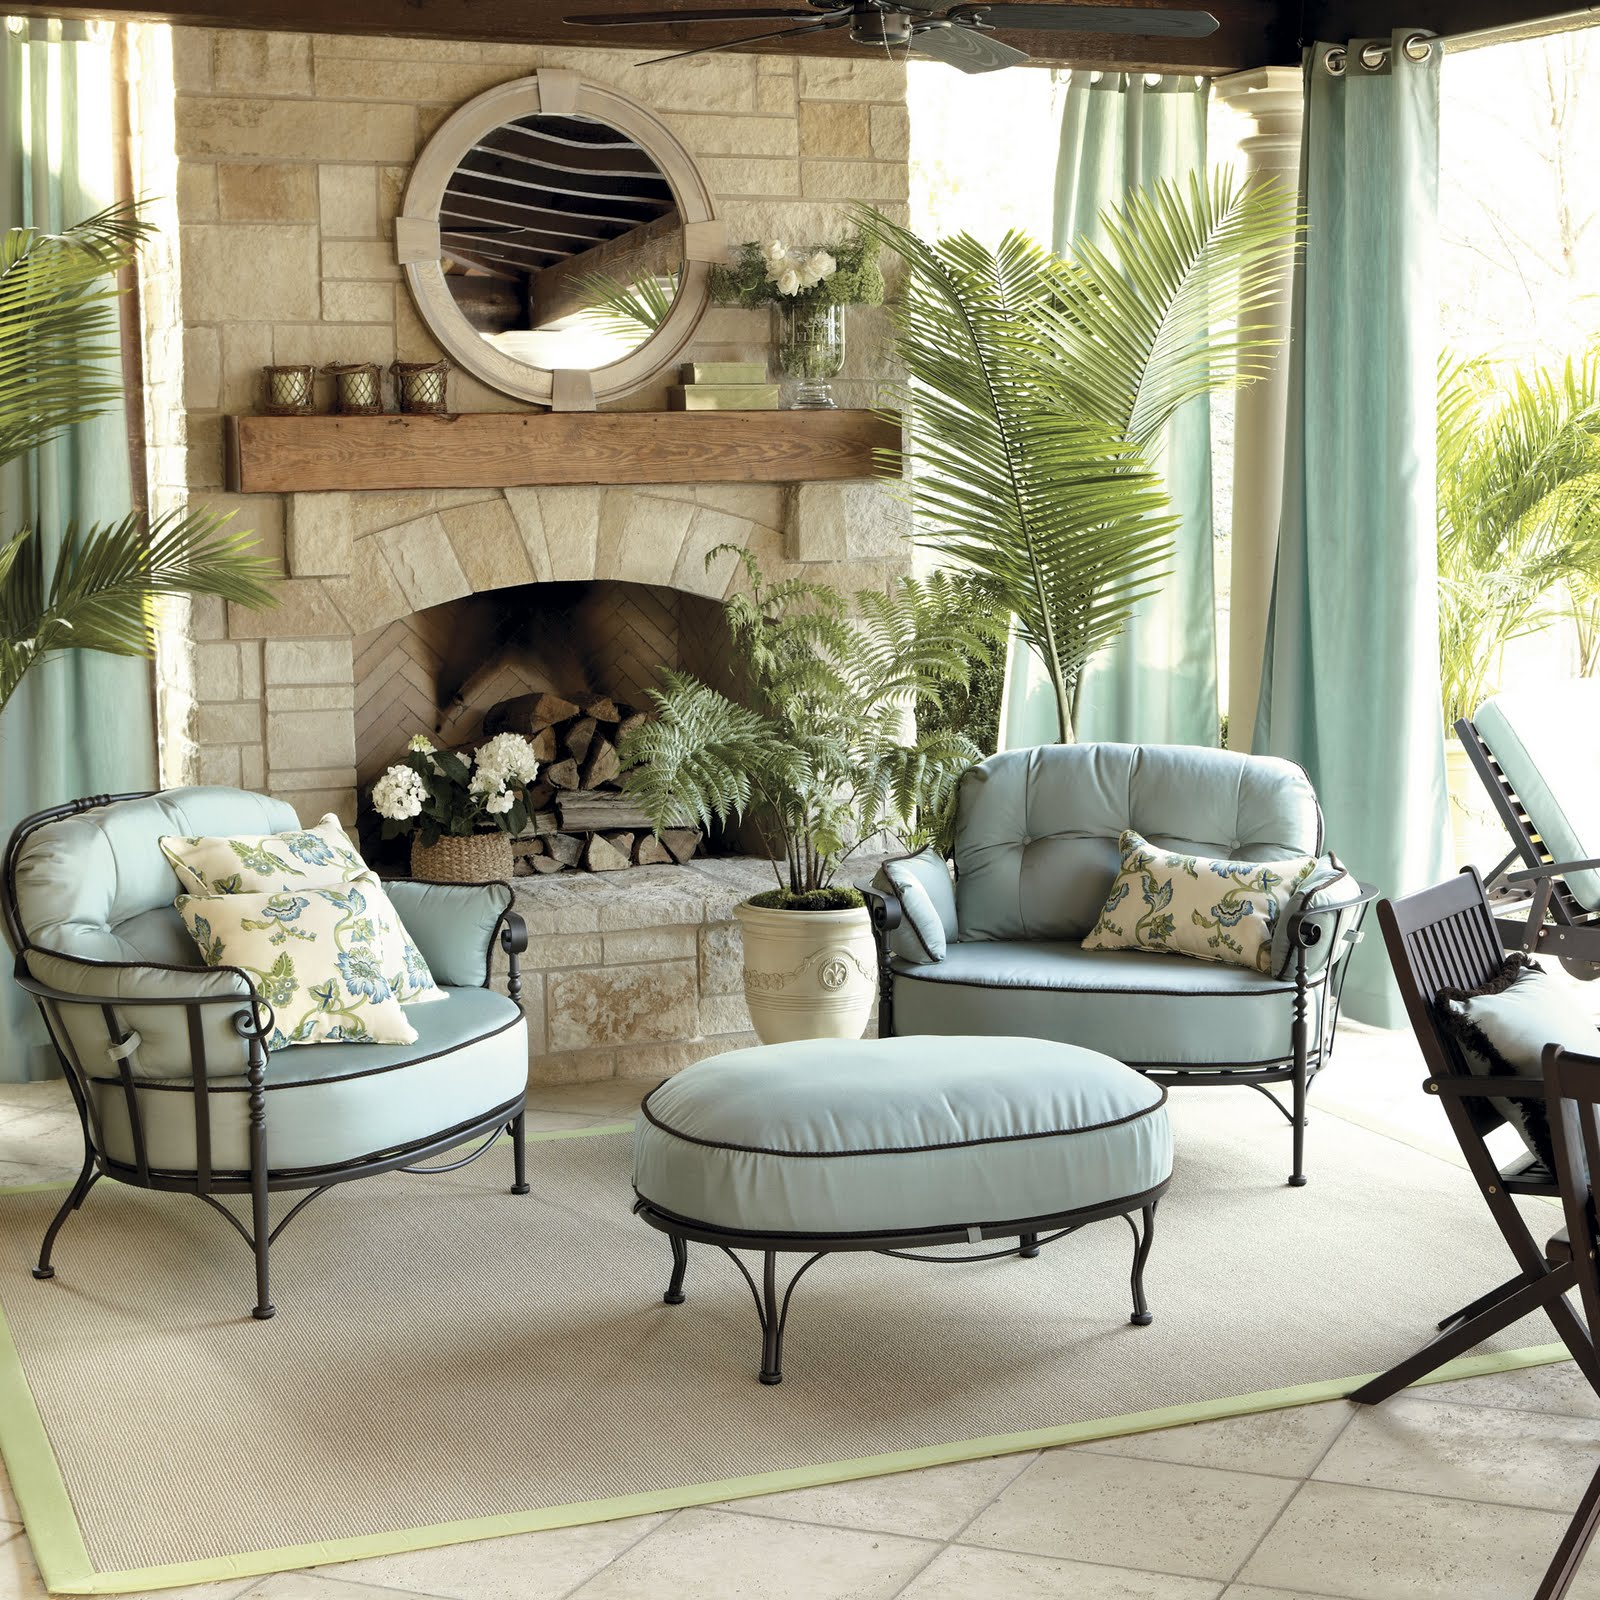 Outdoor Living Room Design: STYLEBEAT: BALLARD DESIGNS TAPS ATLANTA'S SUZANNE KASLER